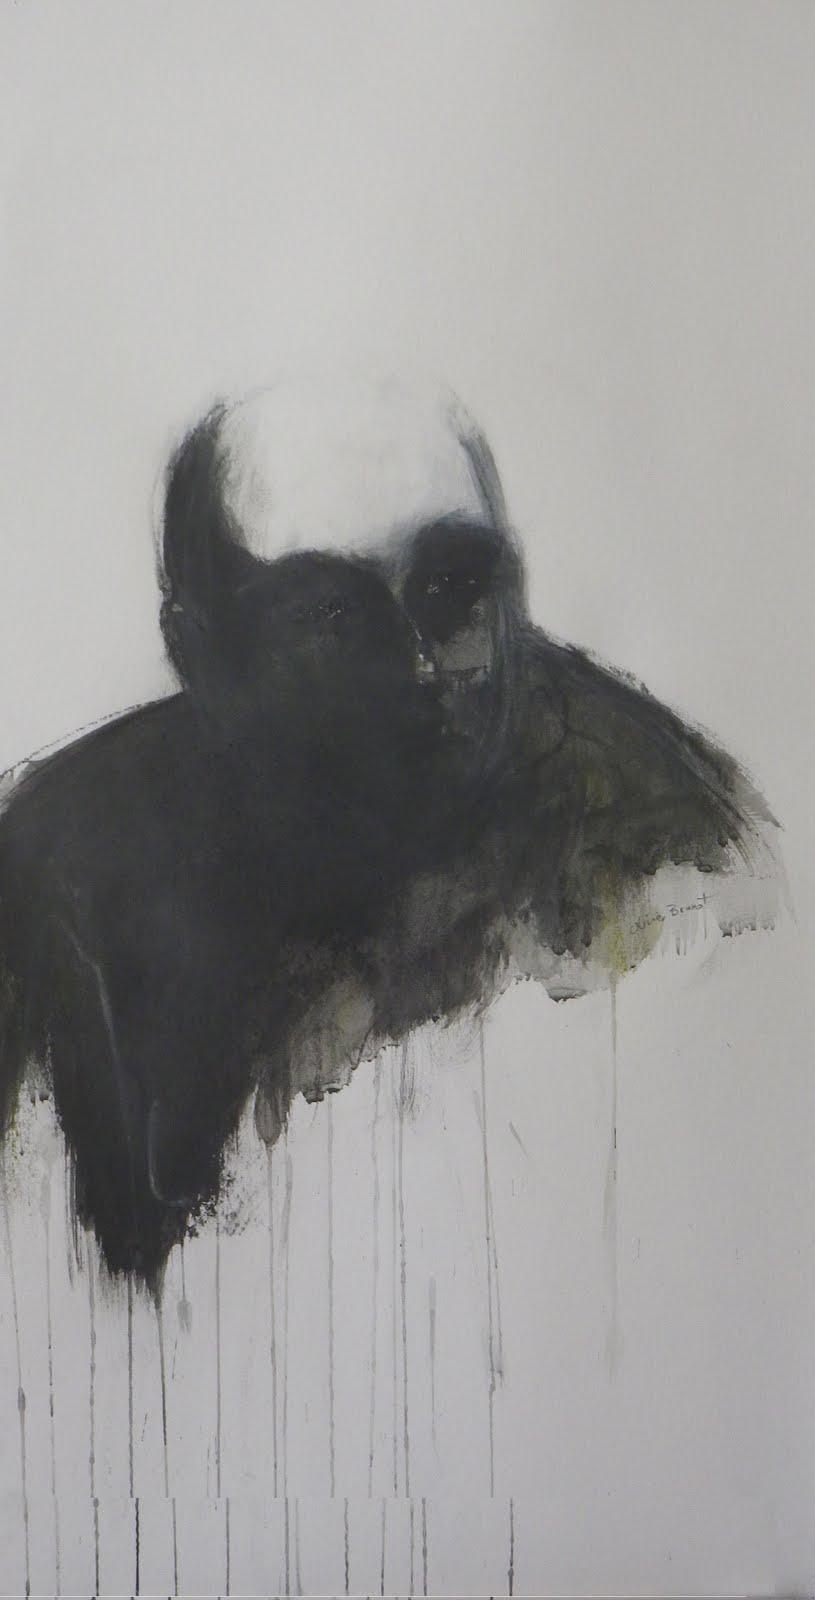 2015/16